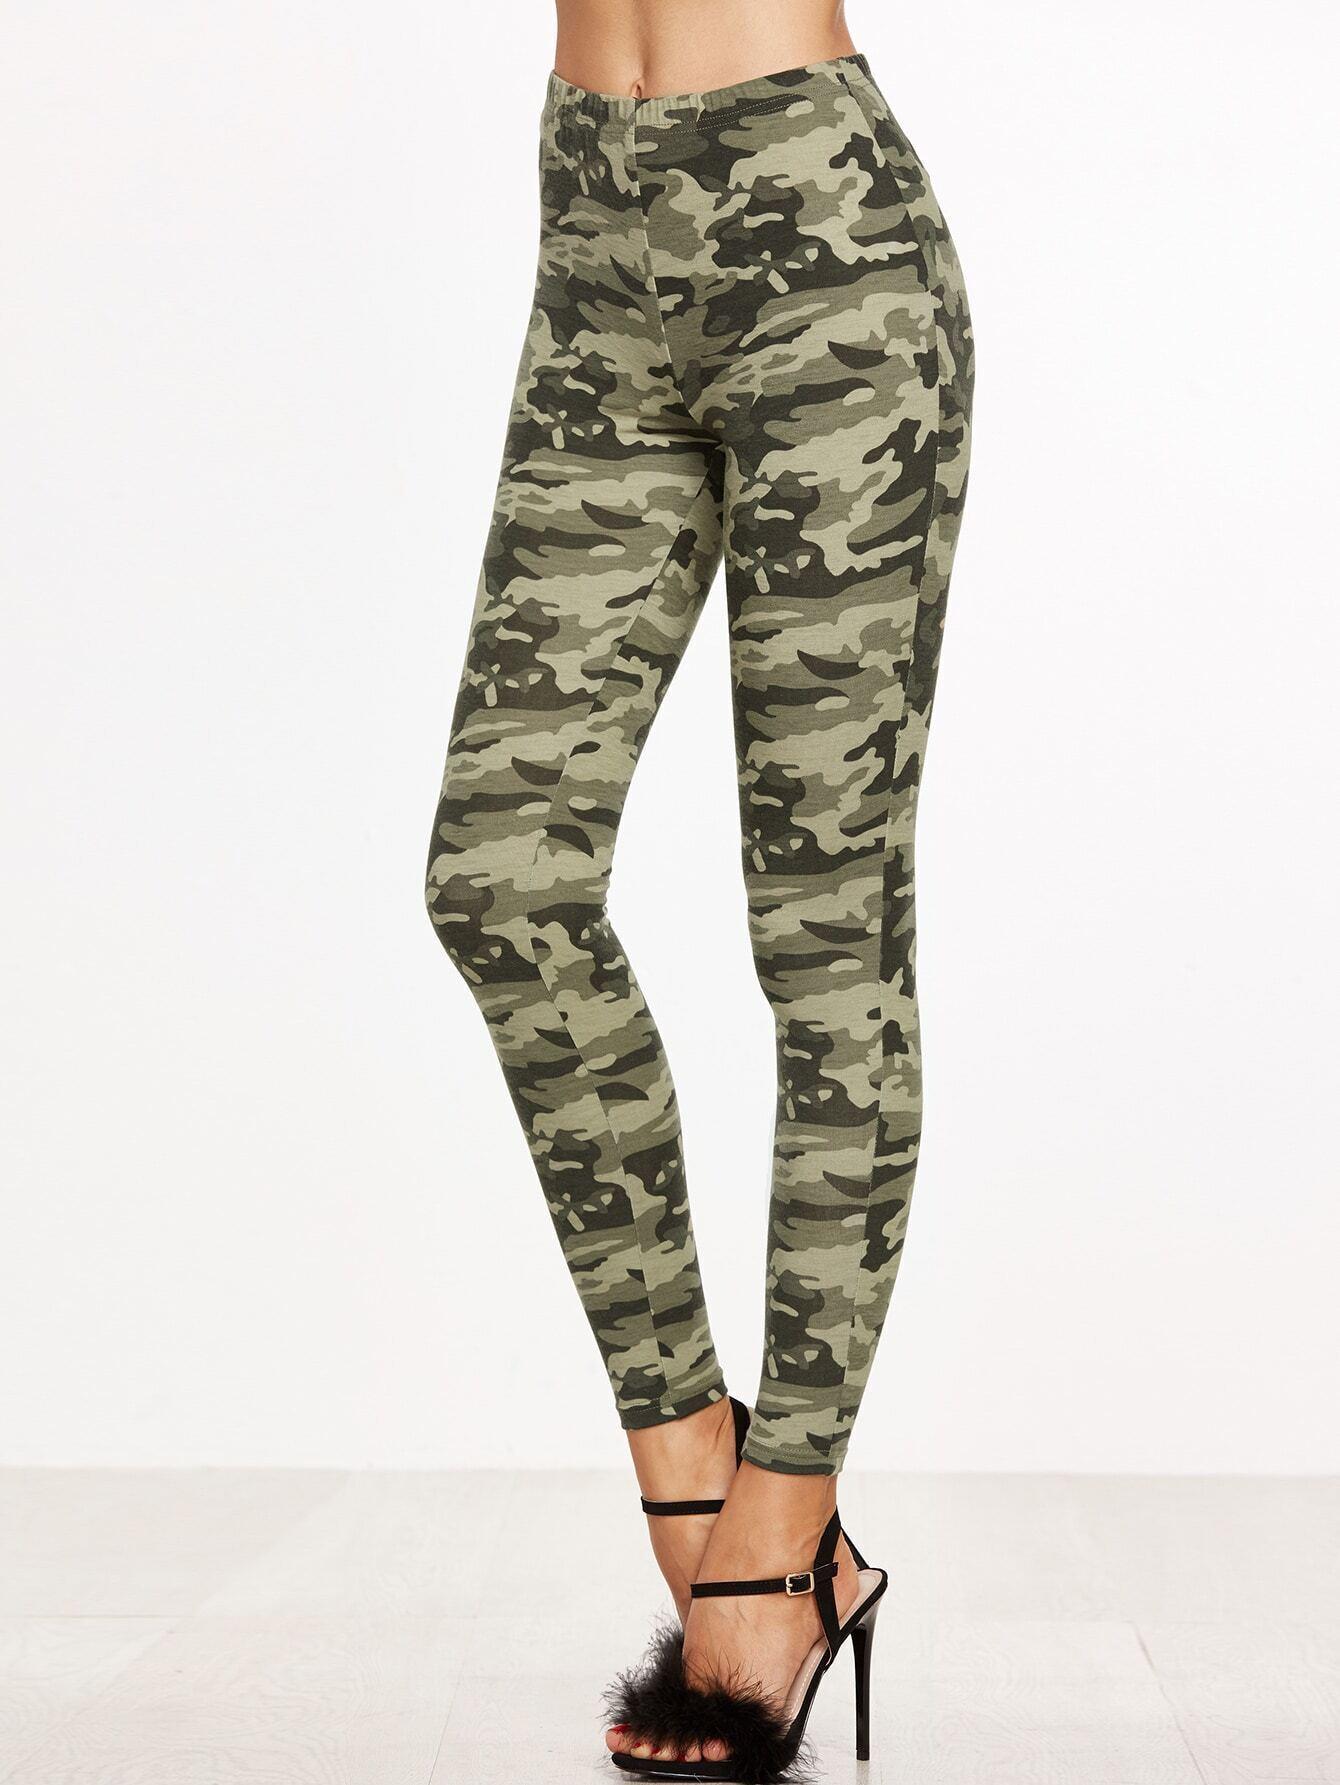 Olive Green Camo Print Leggings EmmaCloth-Women Fast Fashion Online da22faafecd